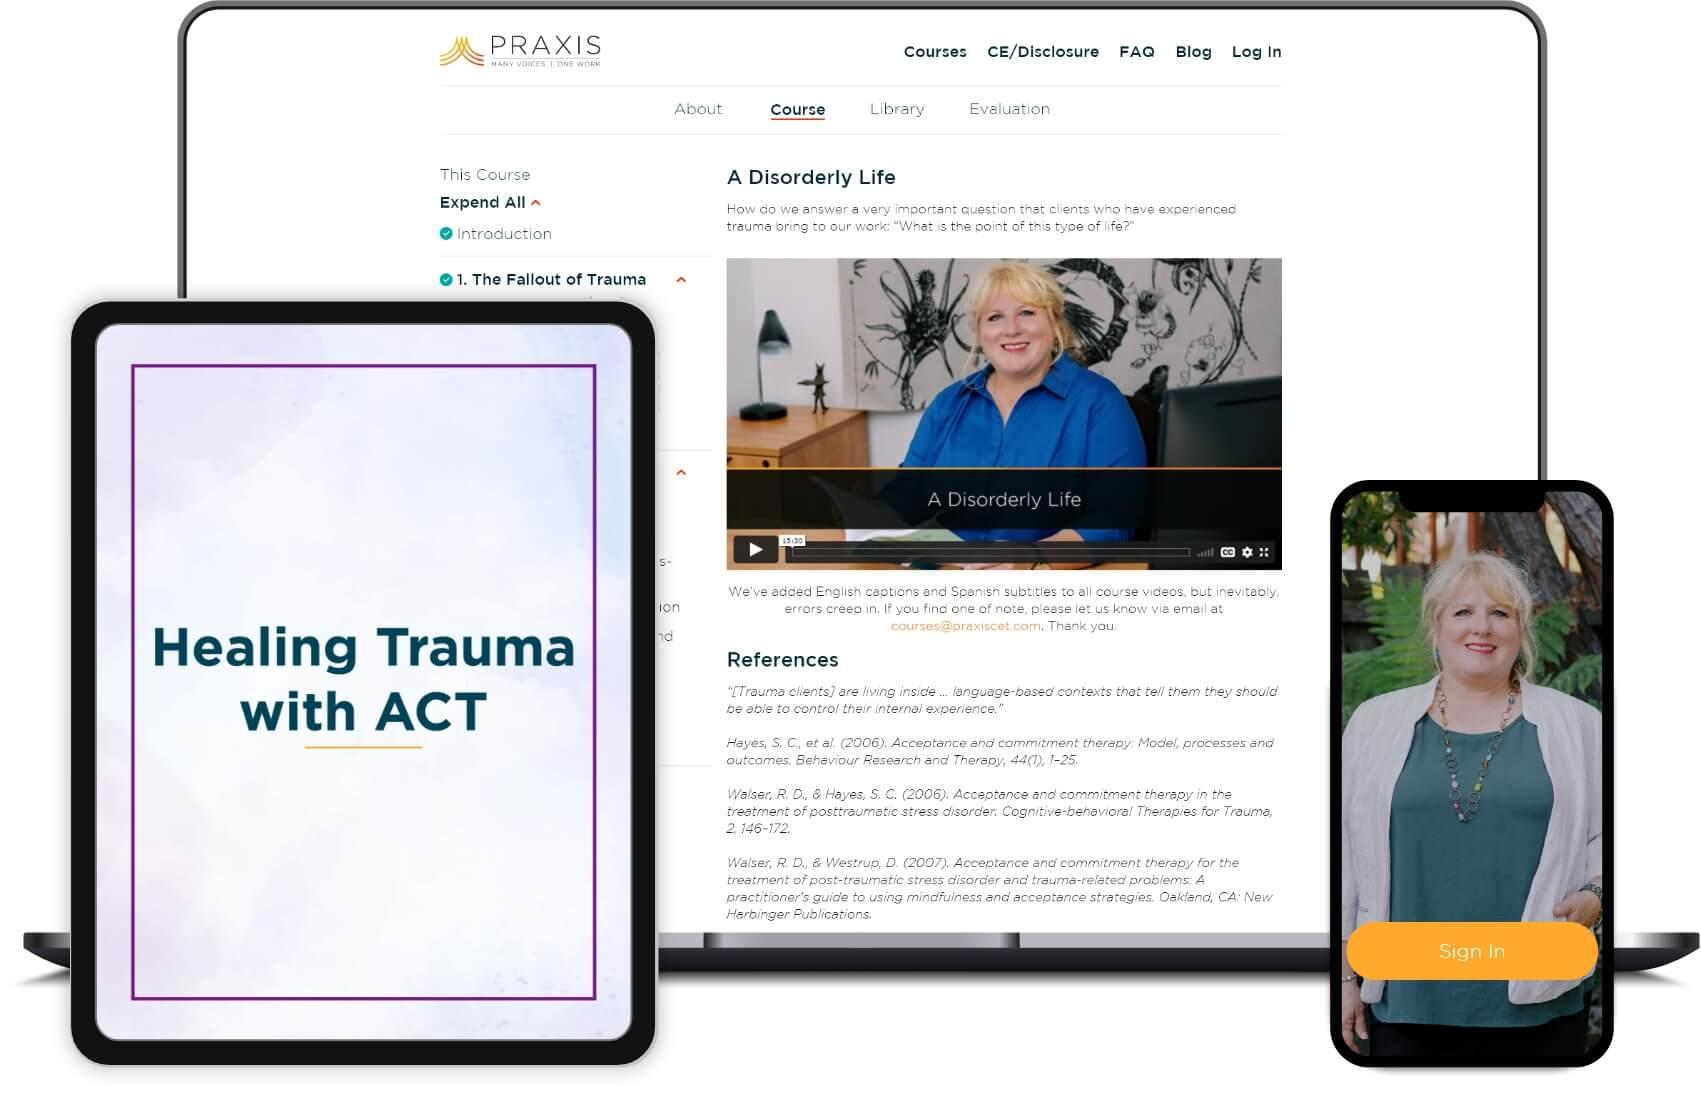 Healing_Trauma_with_ACT_20_14_Course_Mockup@2x